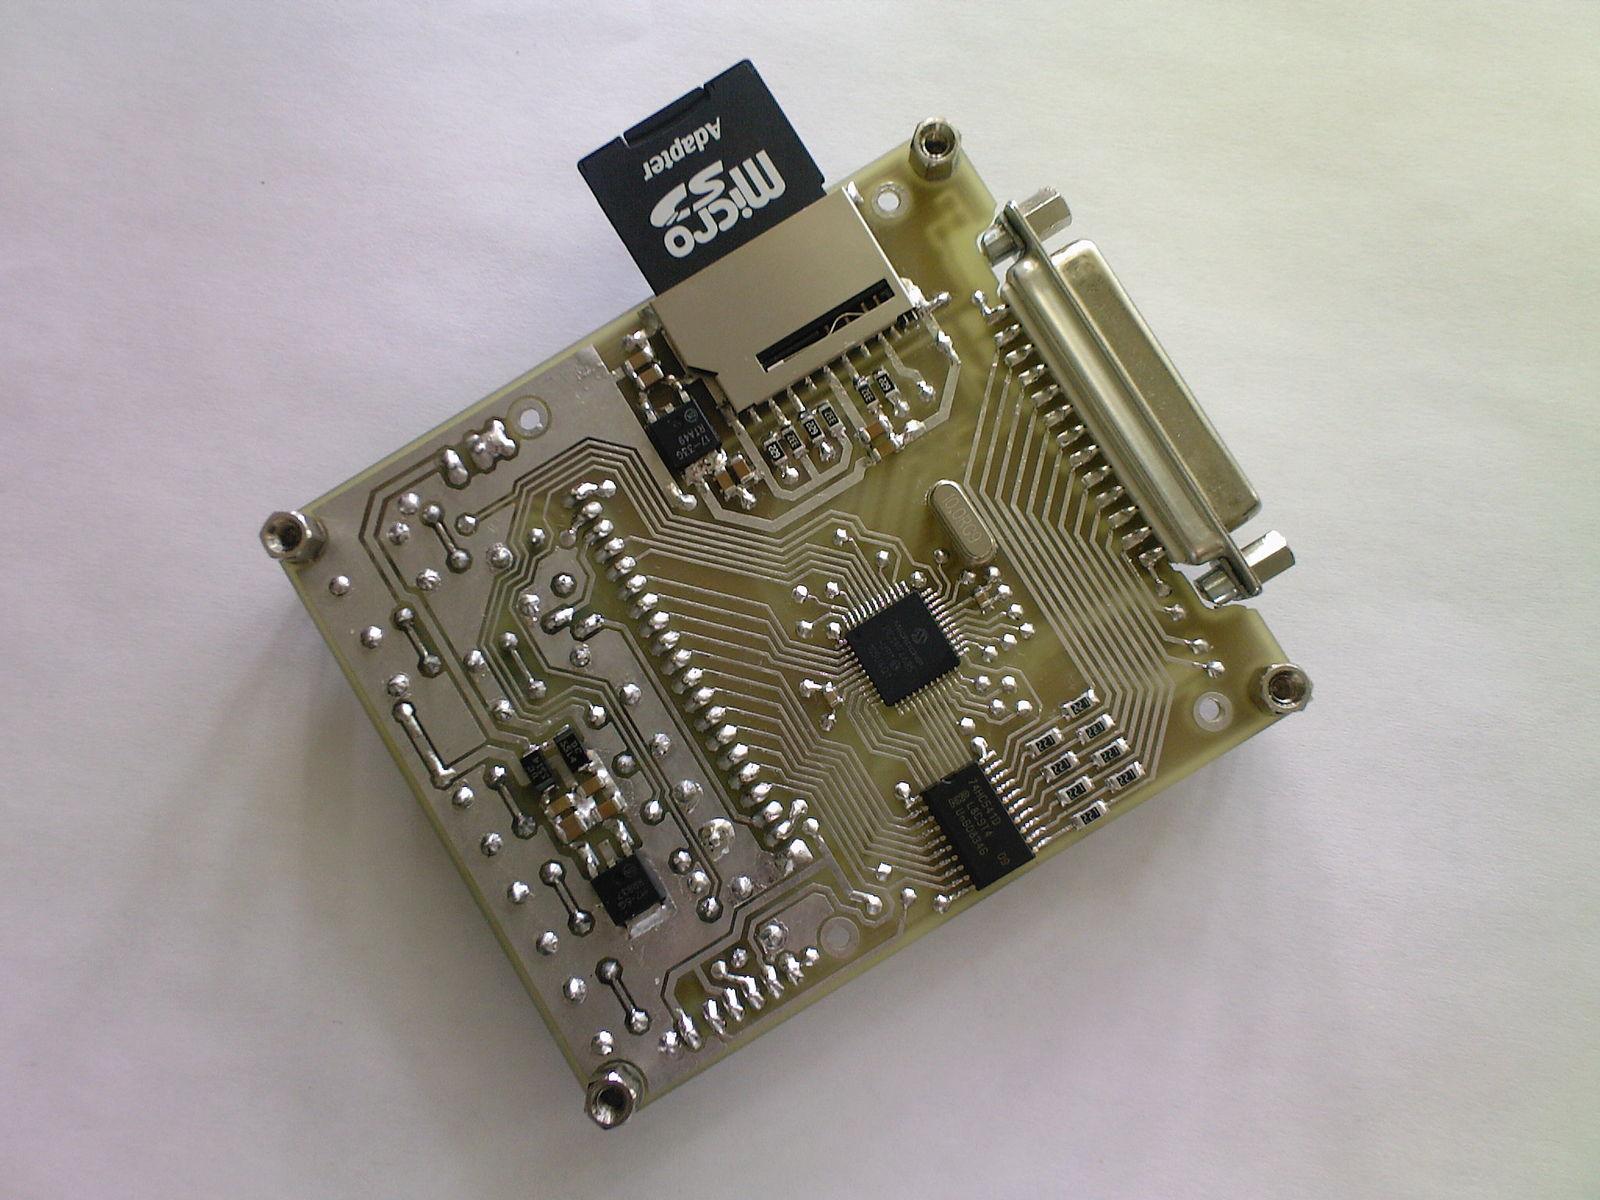 Автономный ЧПУ контроллер